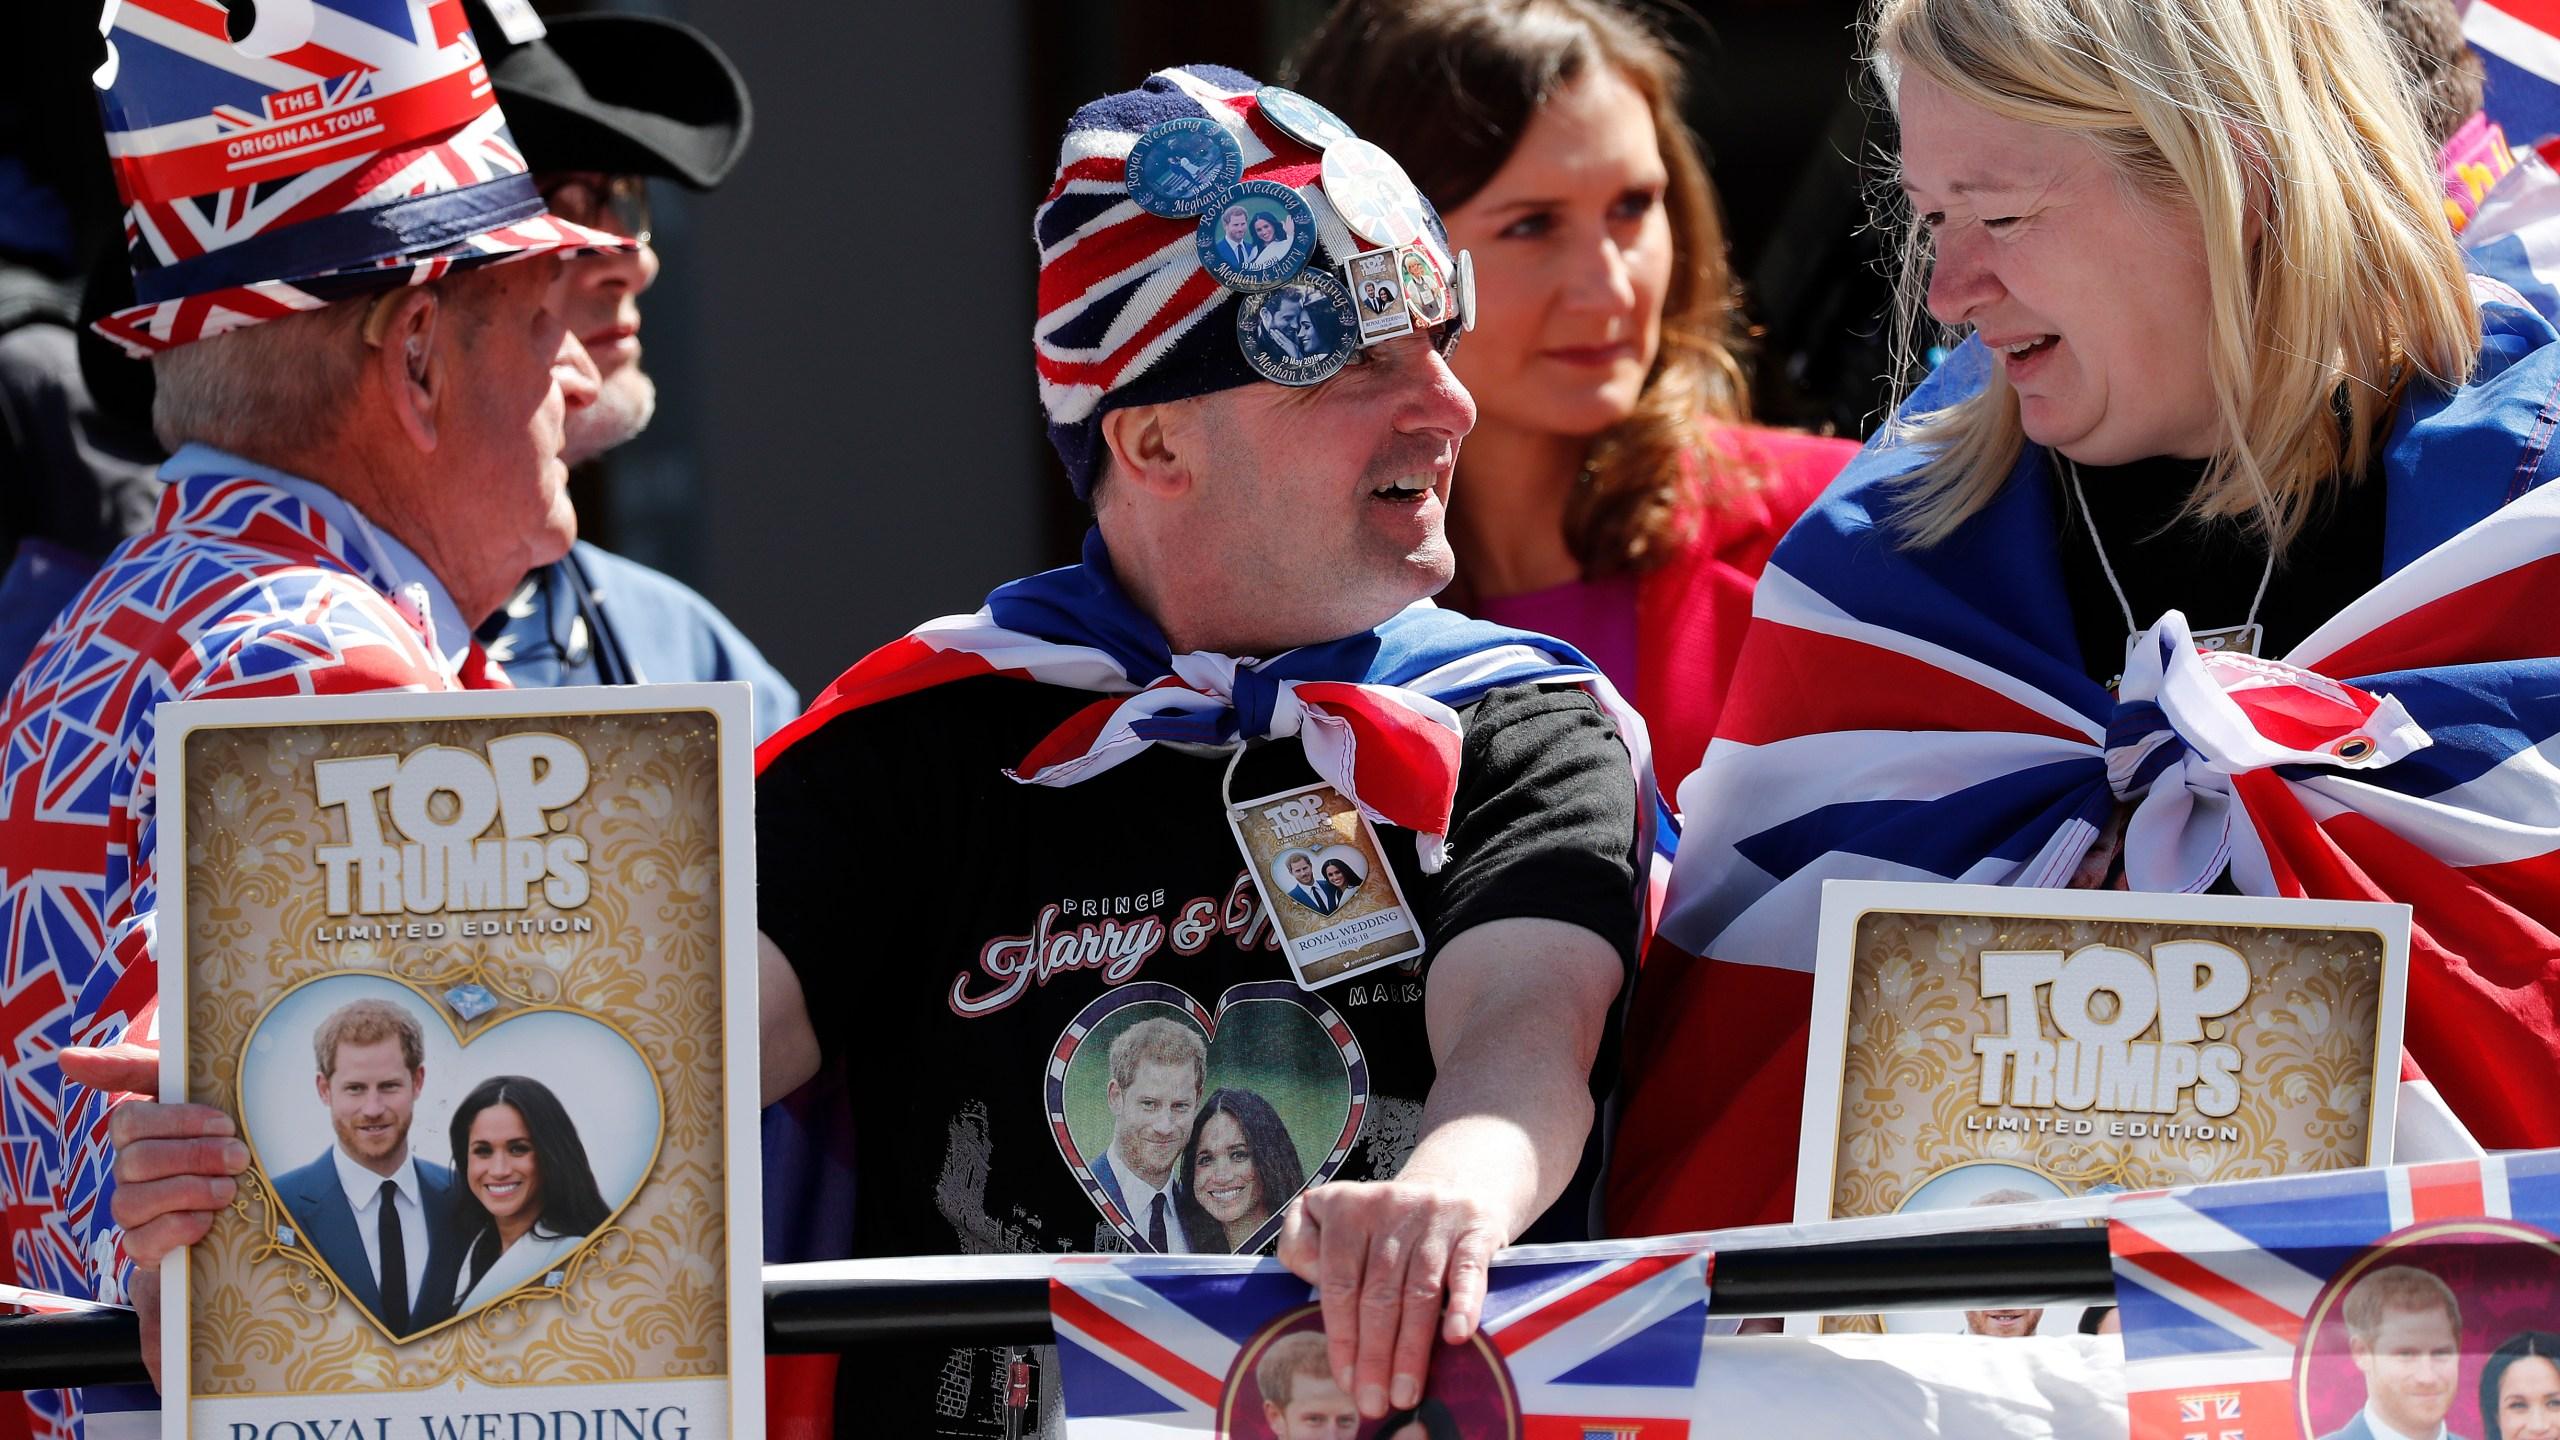 Britain_Royal_Wedding_83544-159532.jpg90115350